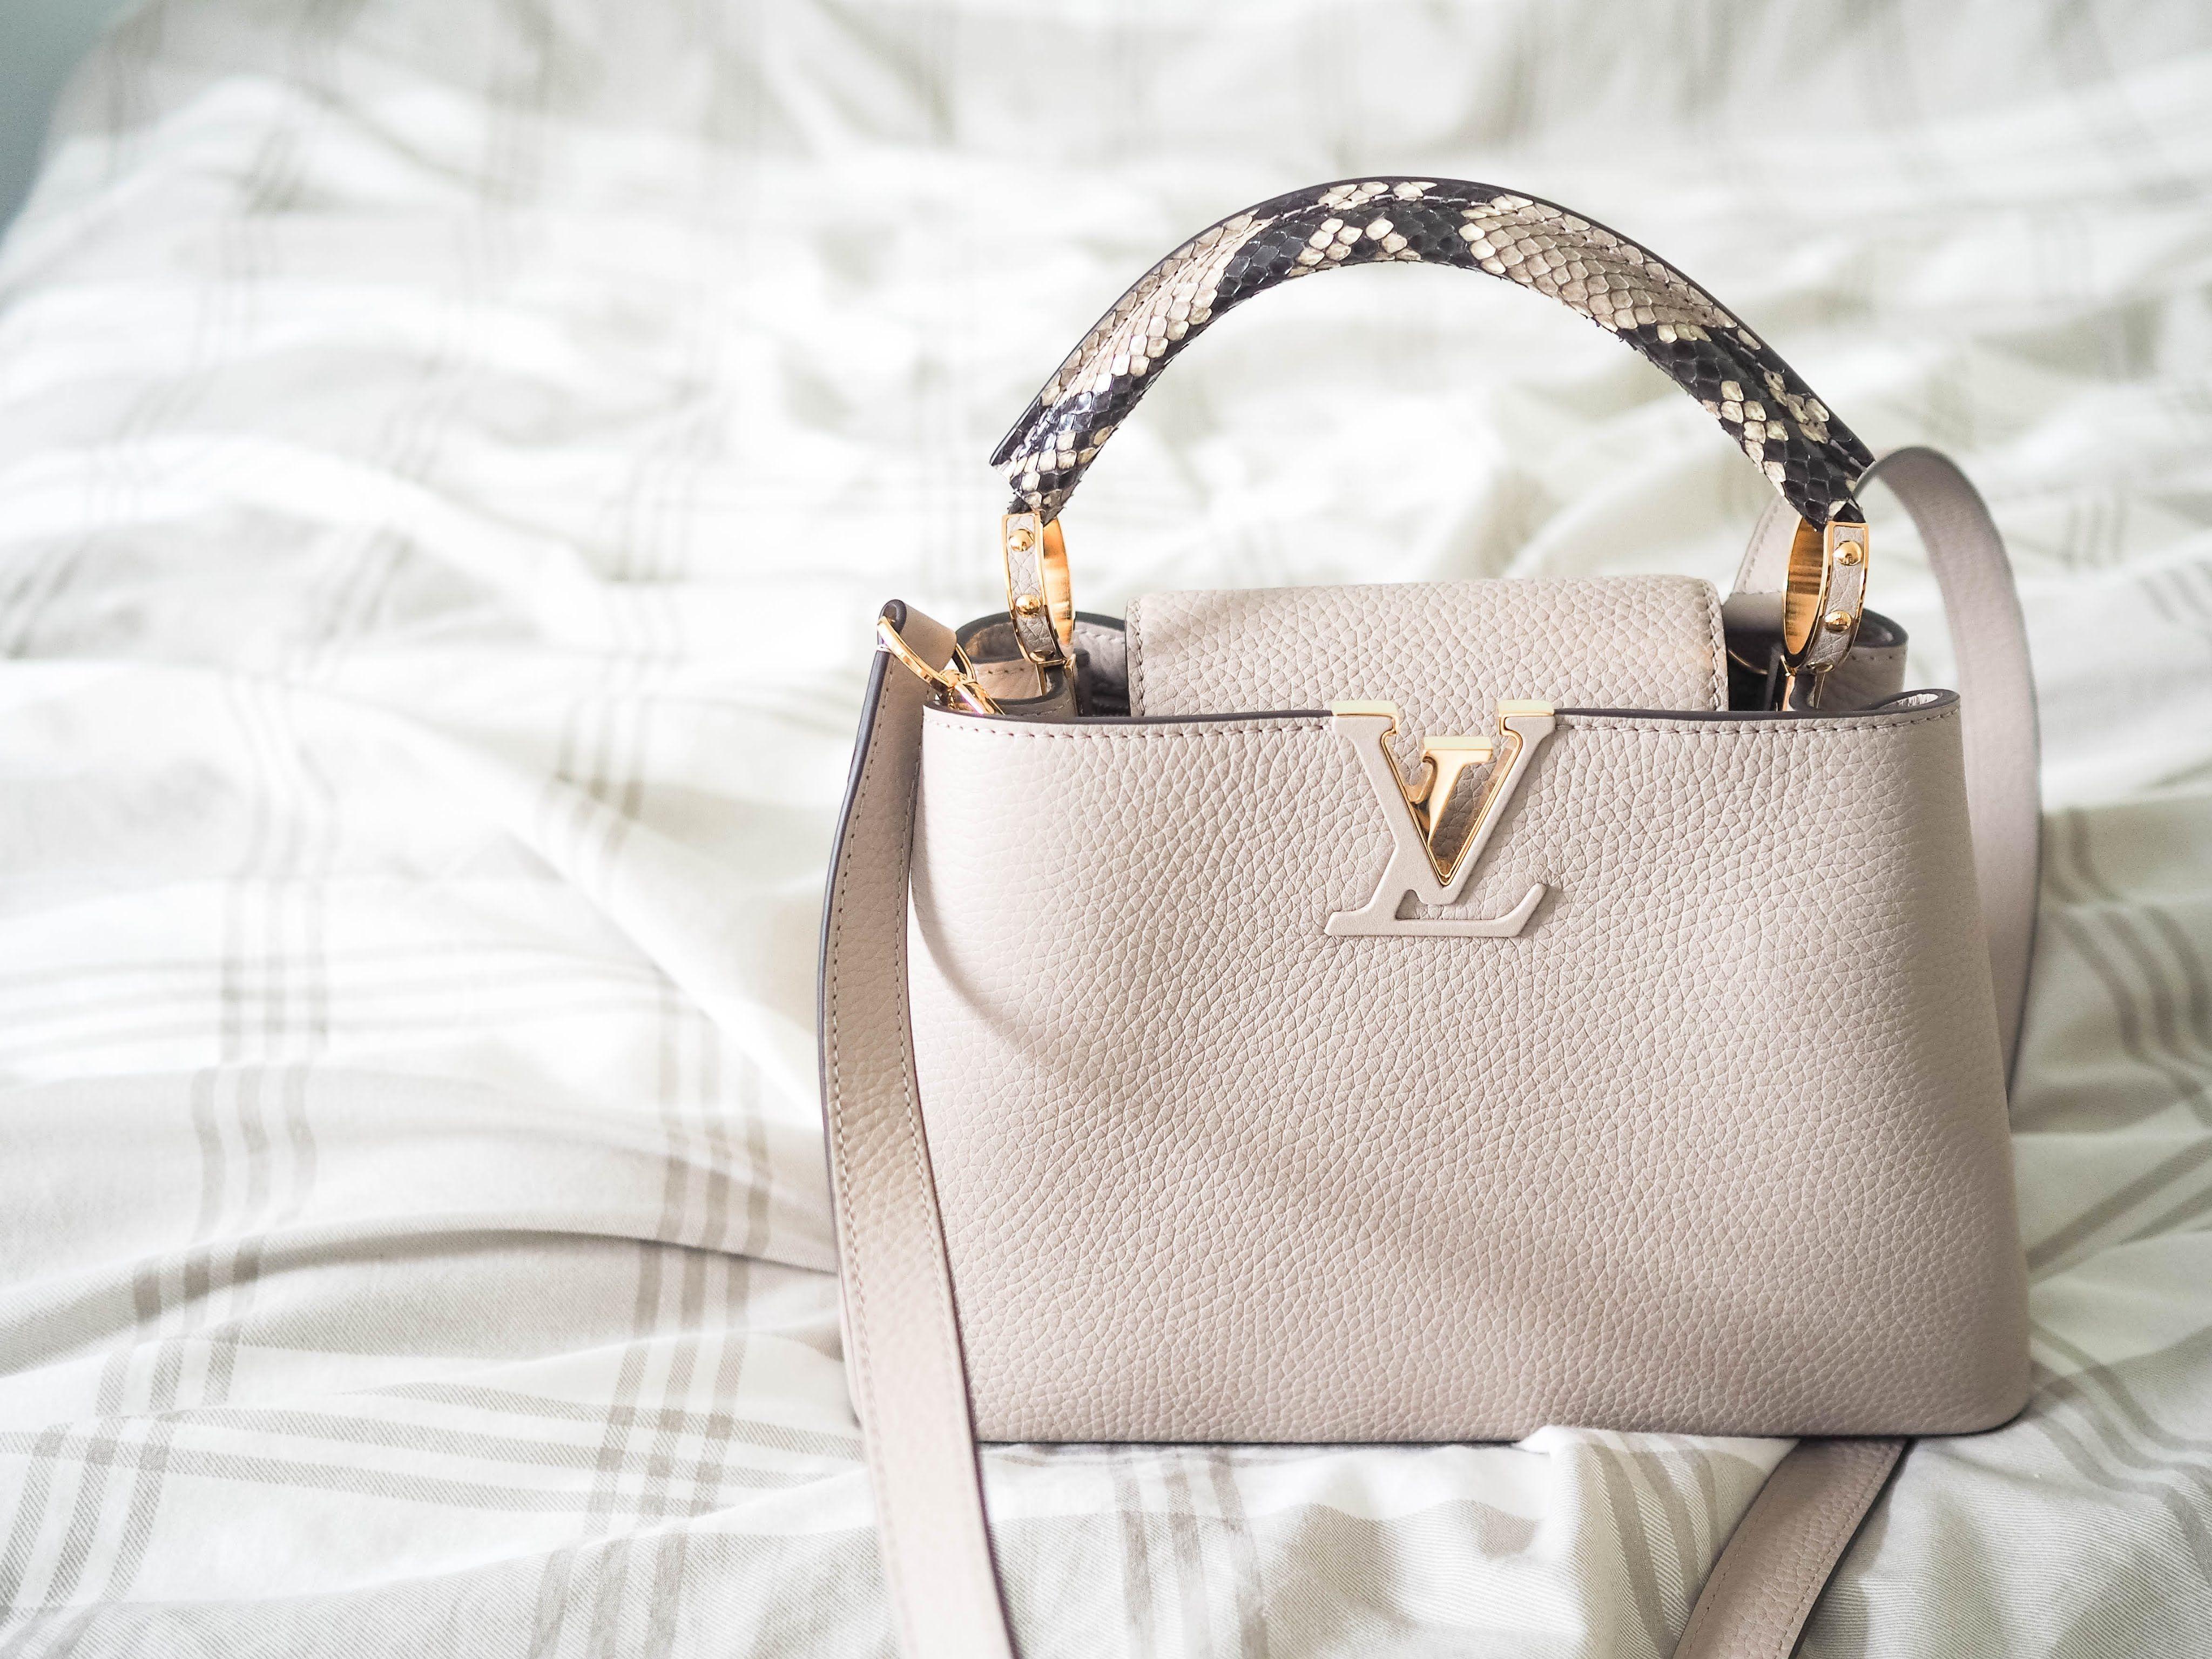 Louis Vuitton Capucines BB Bag with python handle Louis Vuitton Capucine ace1ea0b6392b